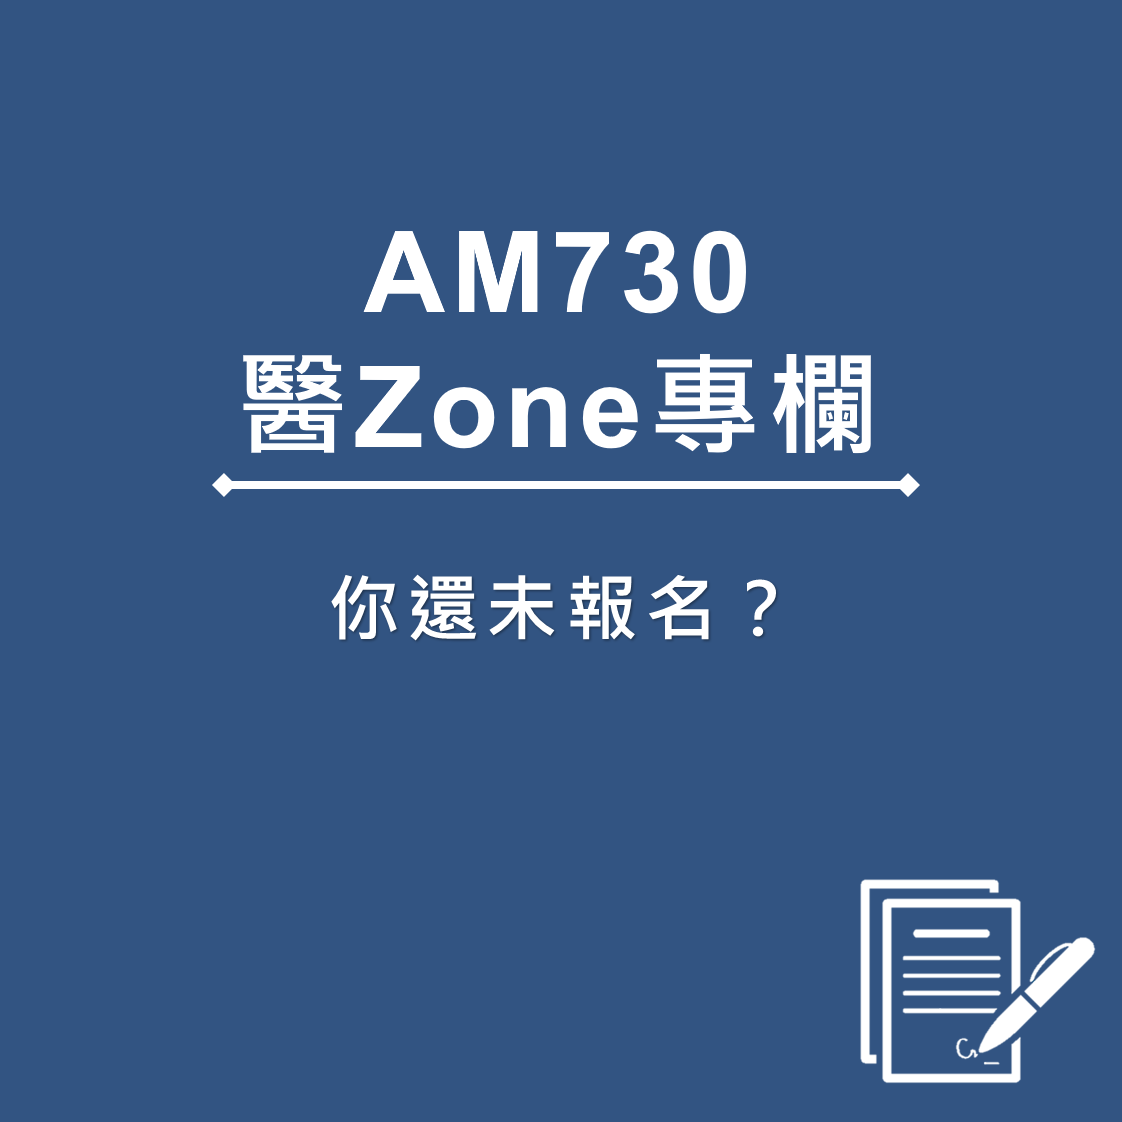 AM730 醫Zone 專欄 - 你還未報名?